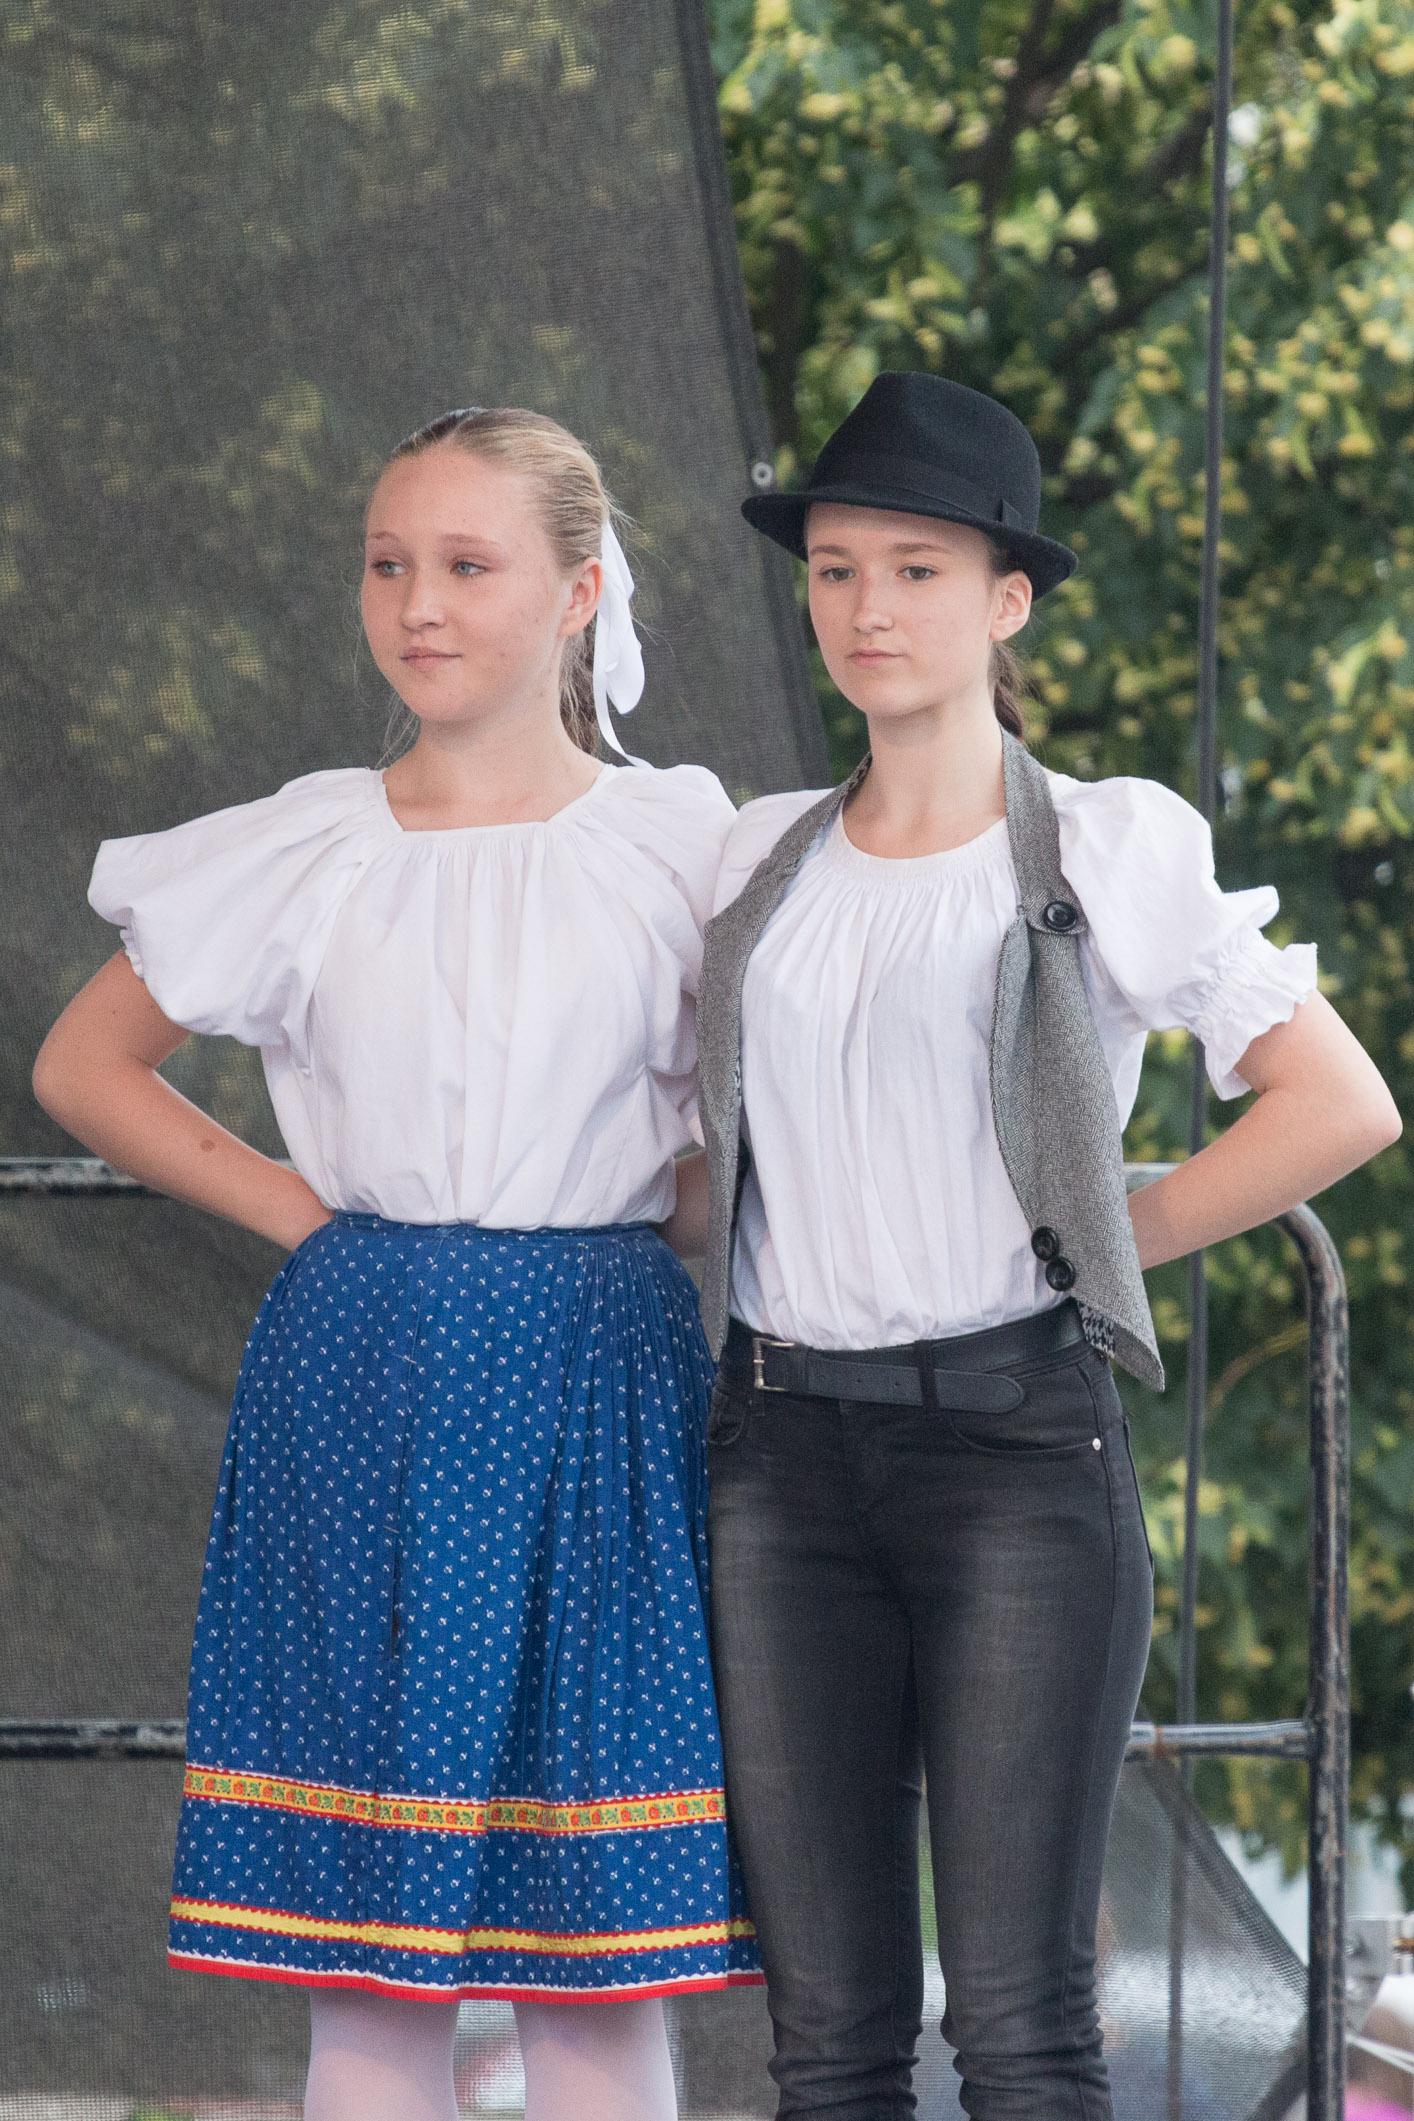 folklor-korzo-2016-zvolen-15